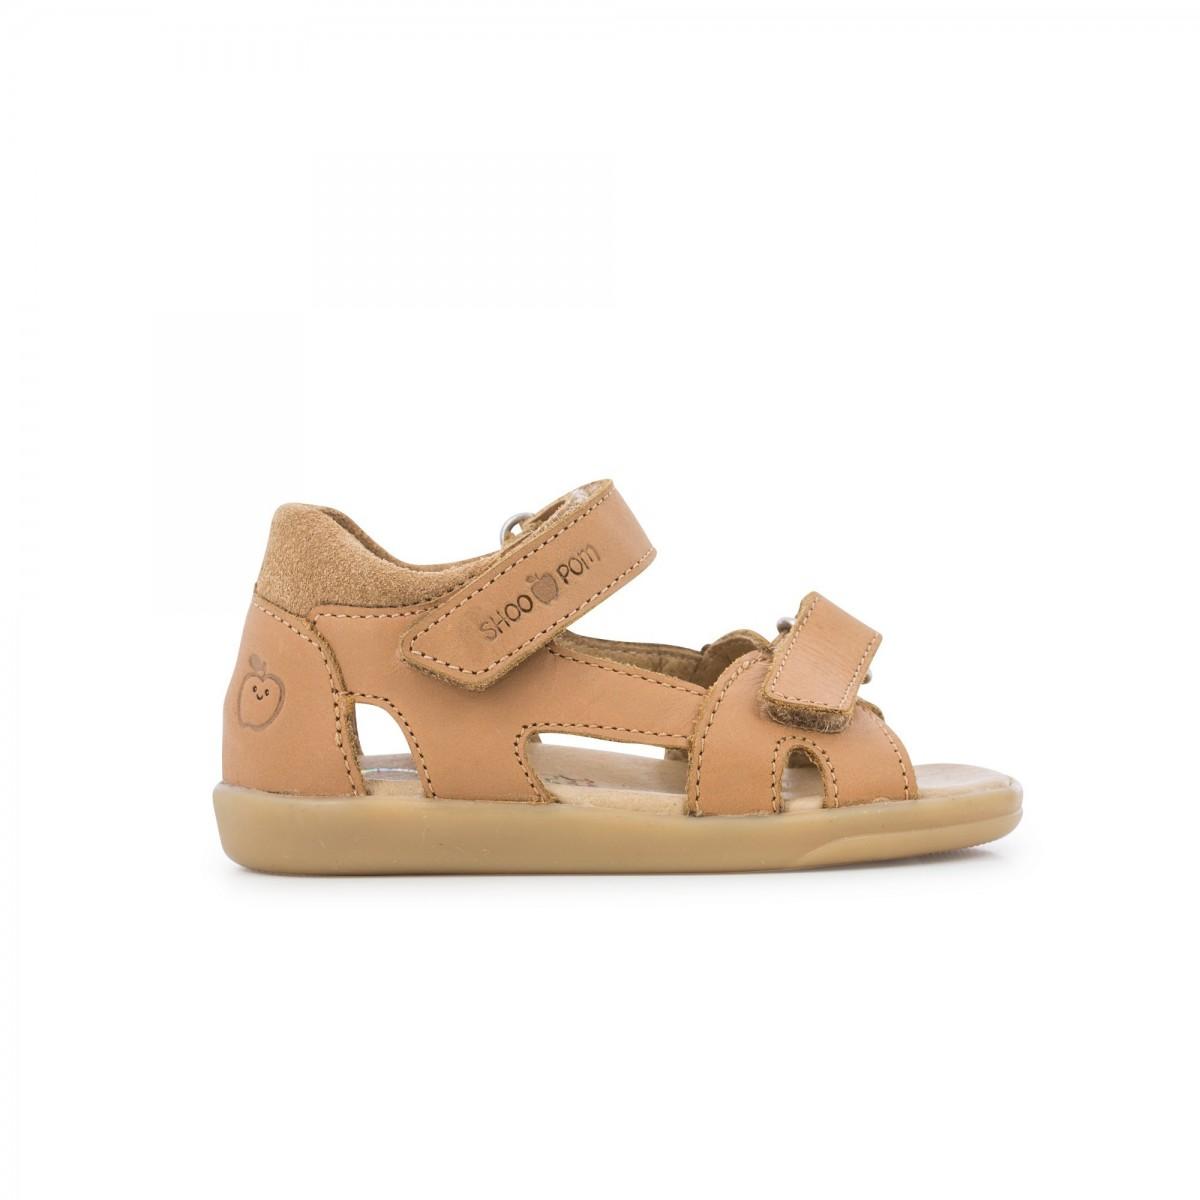 Sandale Pika Shoo Camel